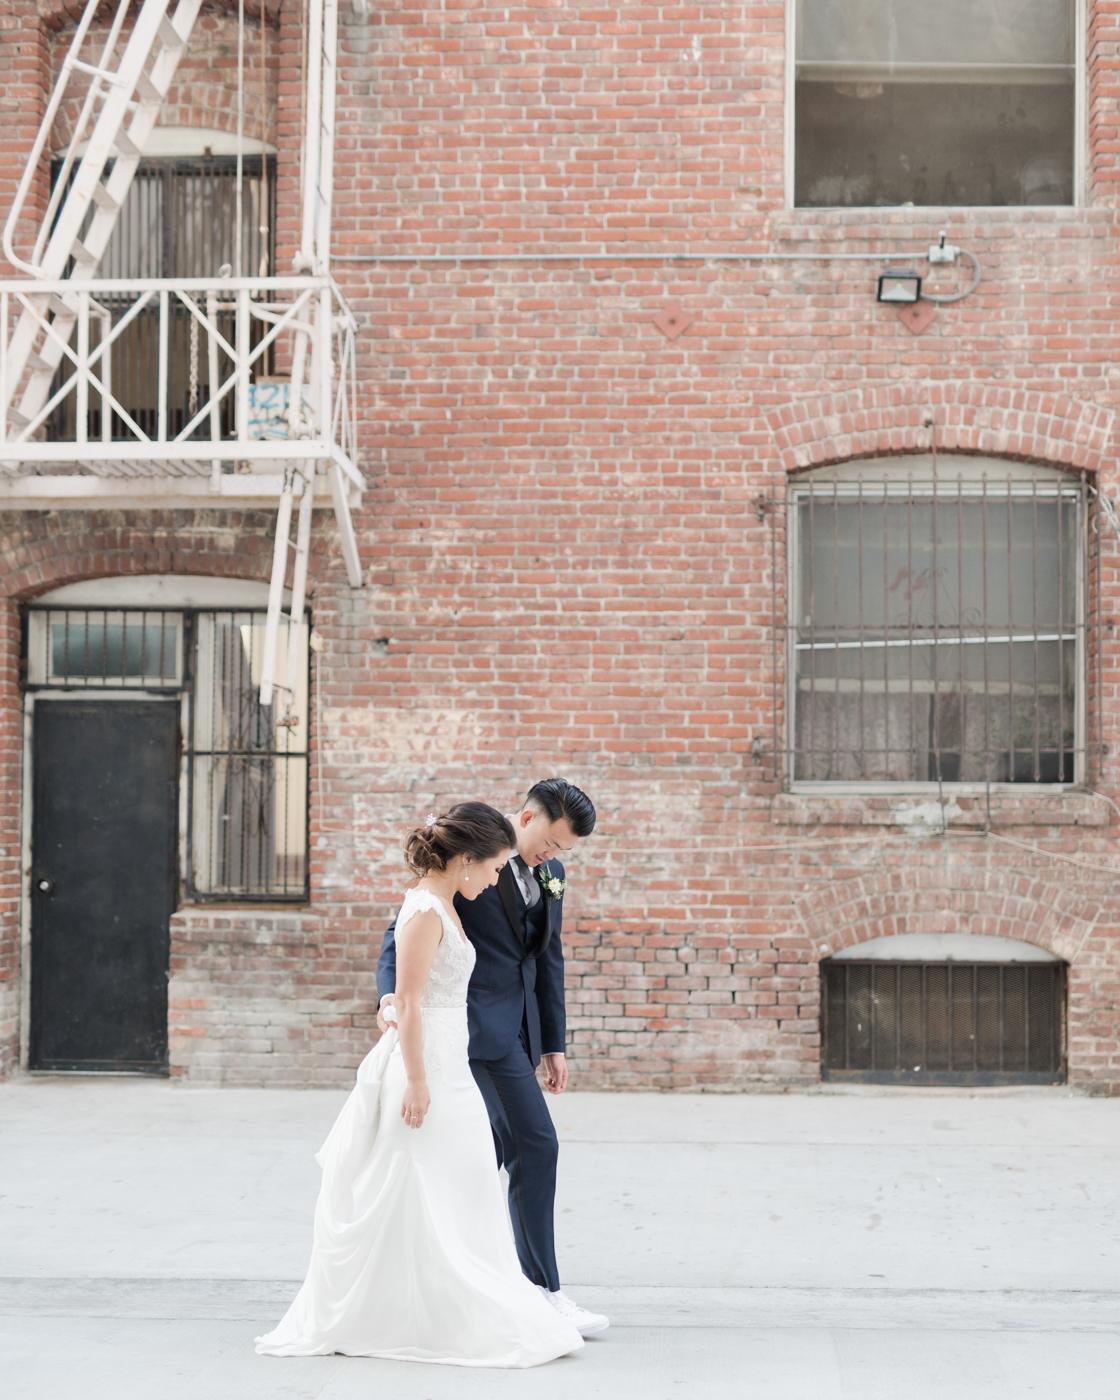 Modern_Wedding_HNYPT_Honeypot_LA_Photographer_Los_Angeles-42.jpg